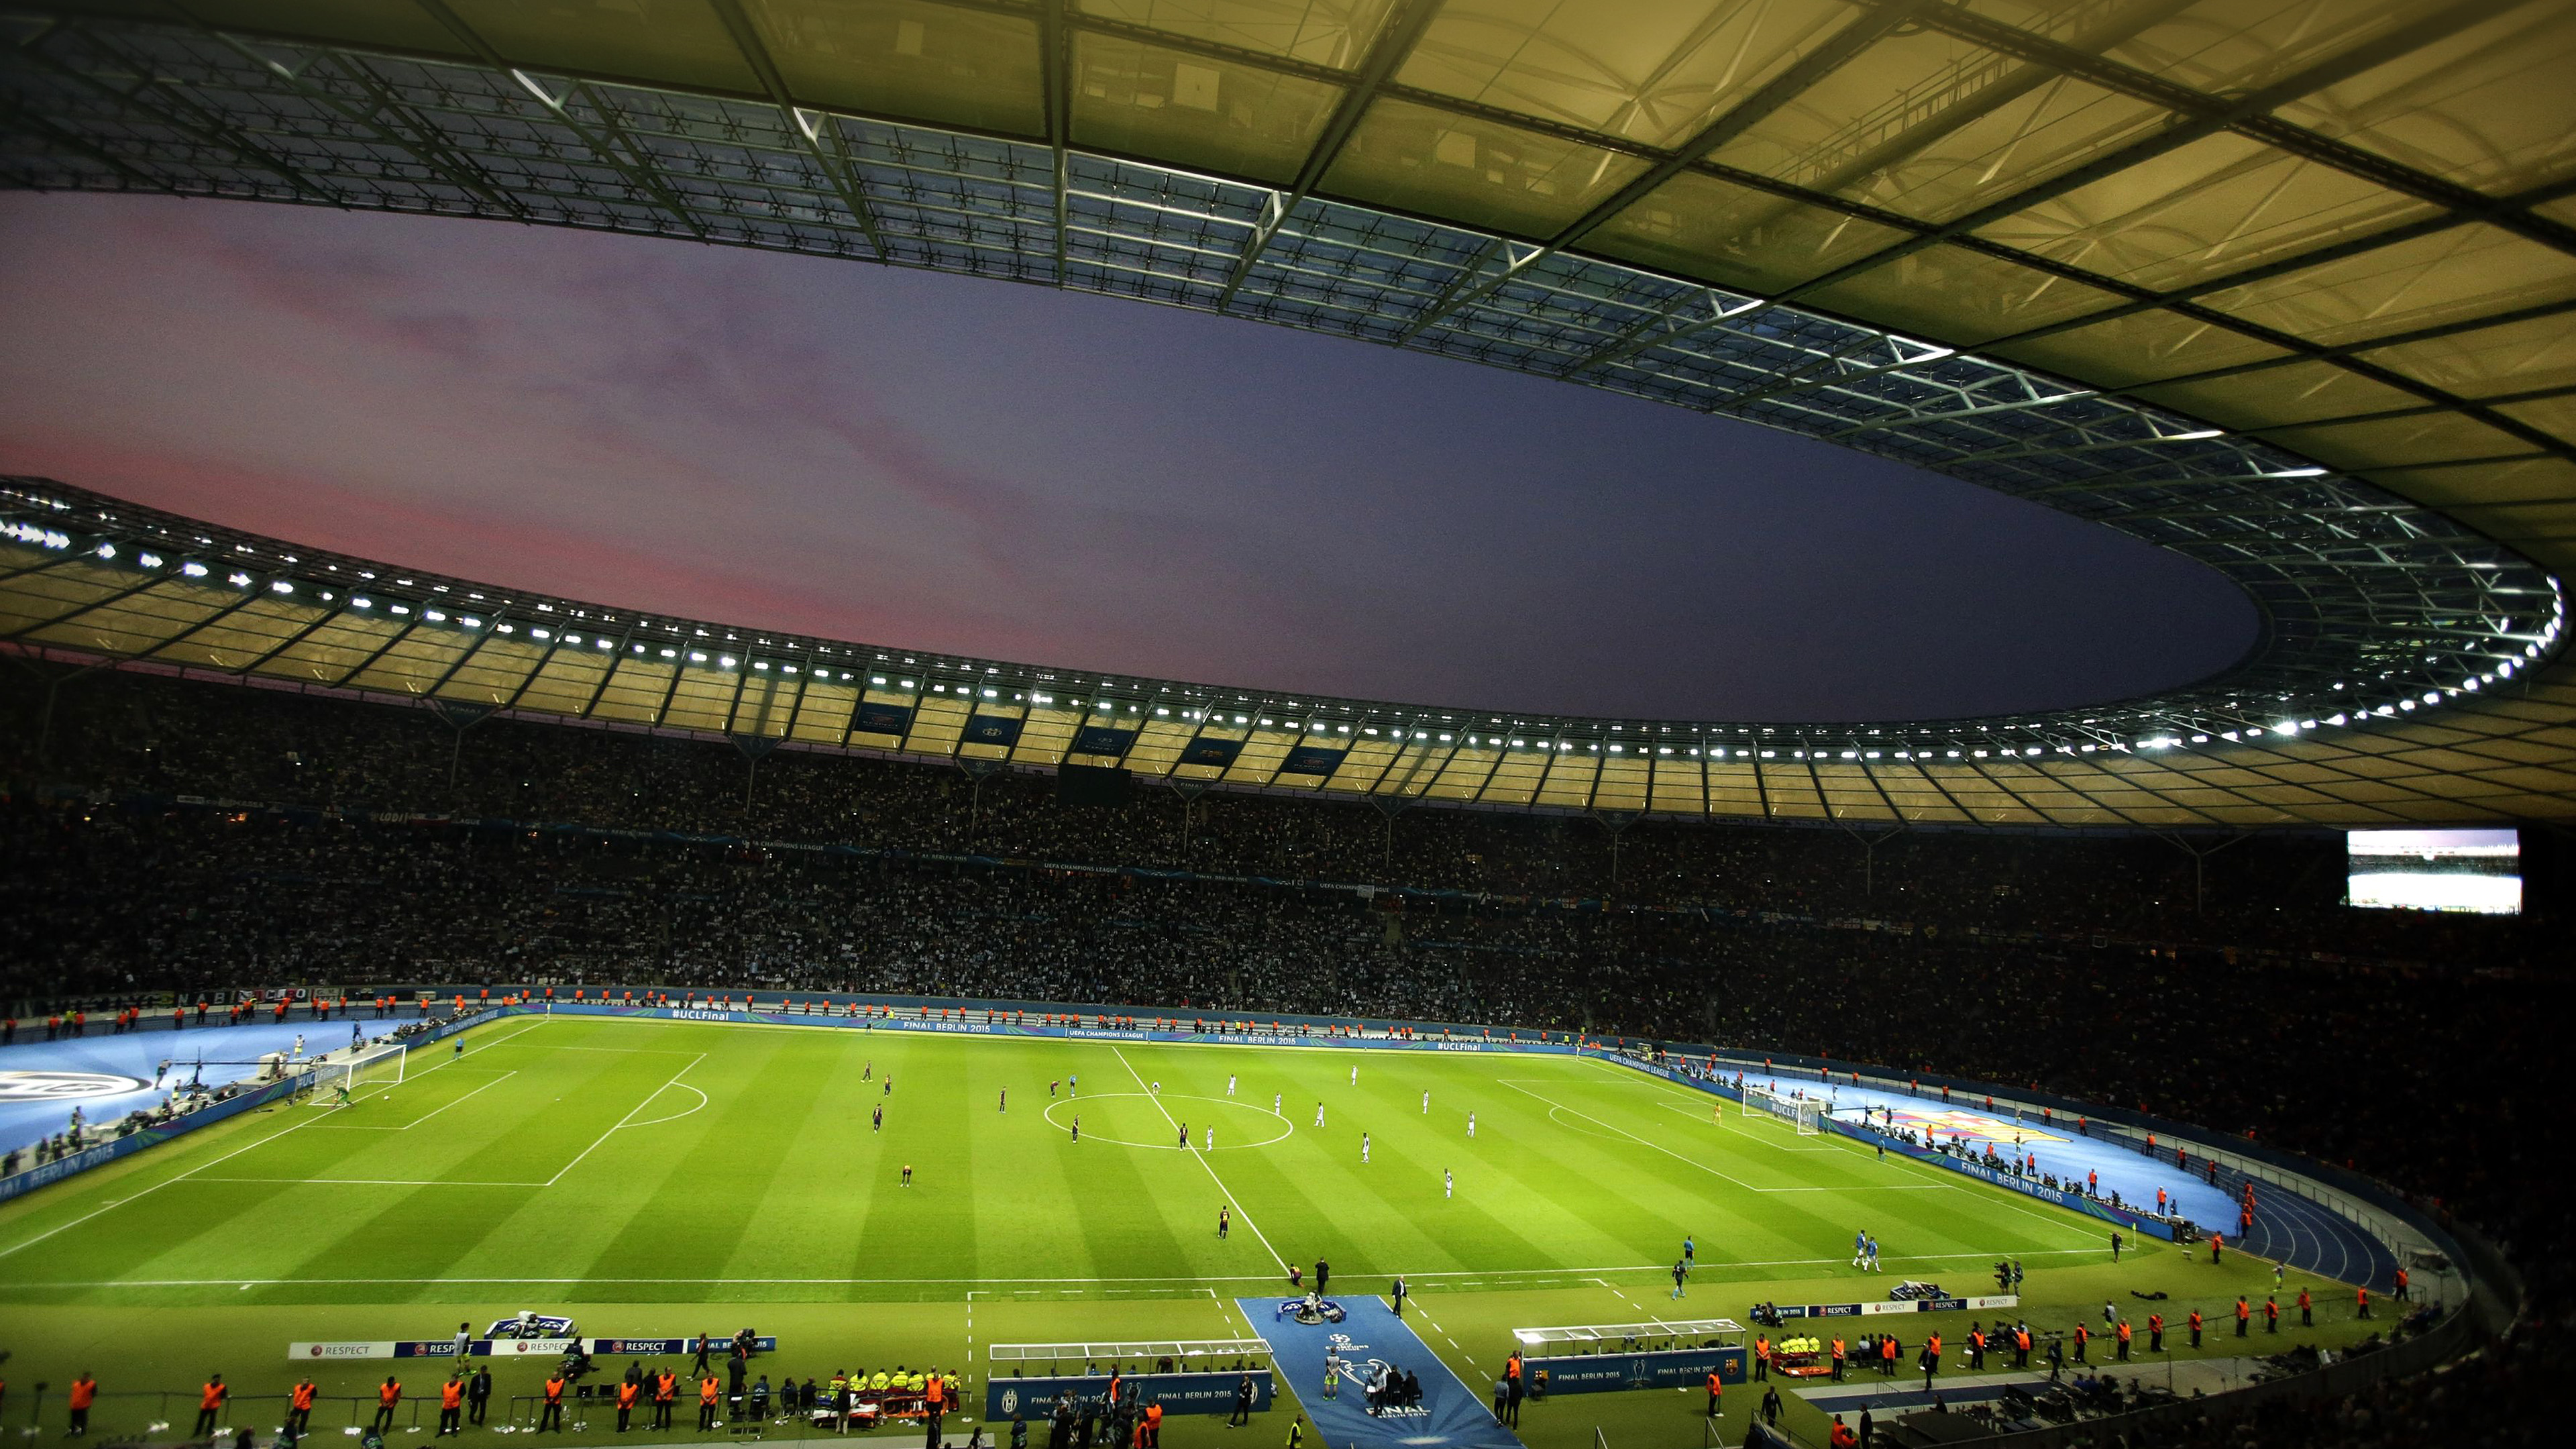 Wonderful Wallpaper Macbook Soccer - papers  You Should Have_222771.jpg